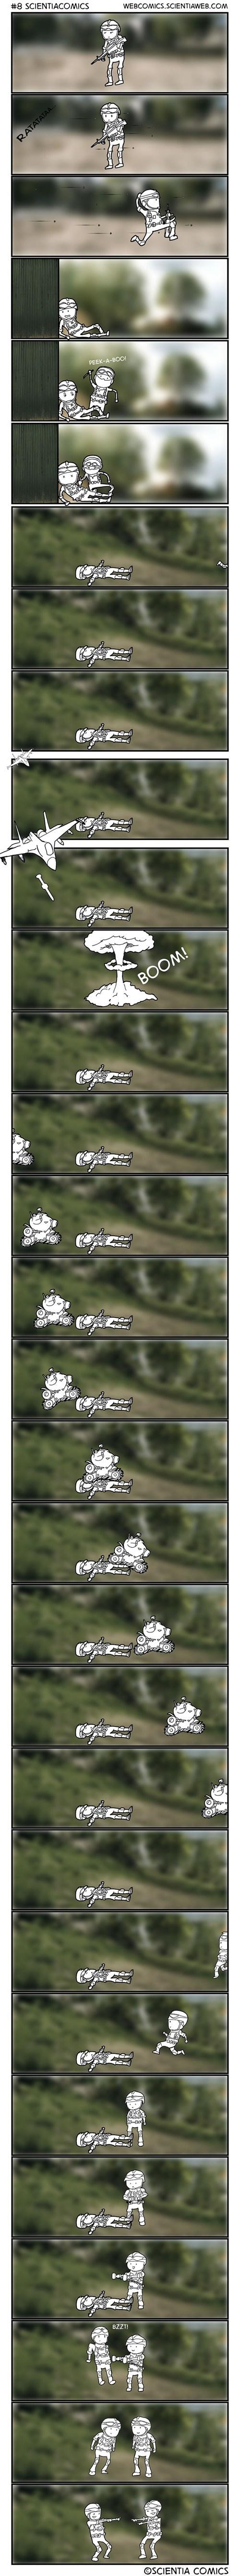 comics,Battlefield 3